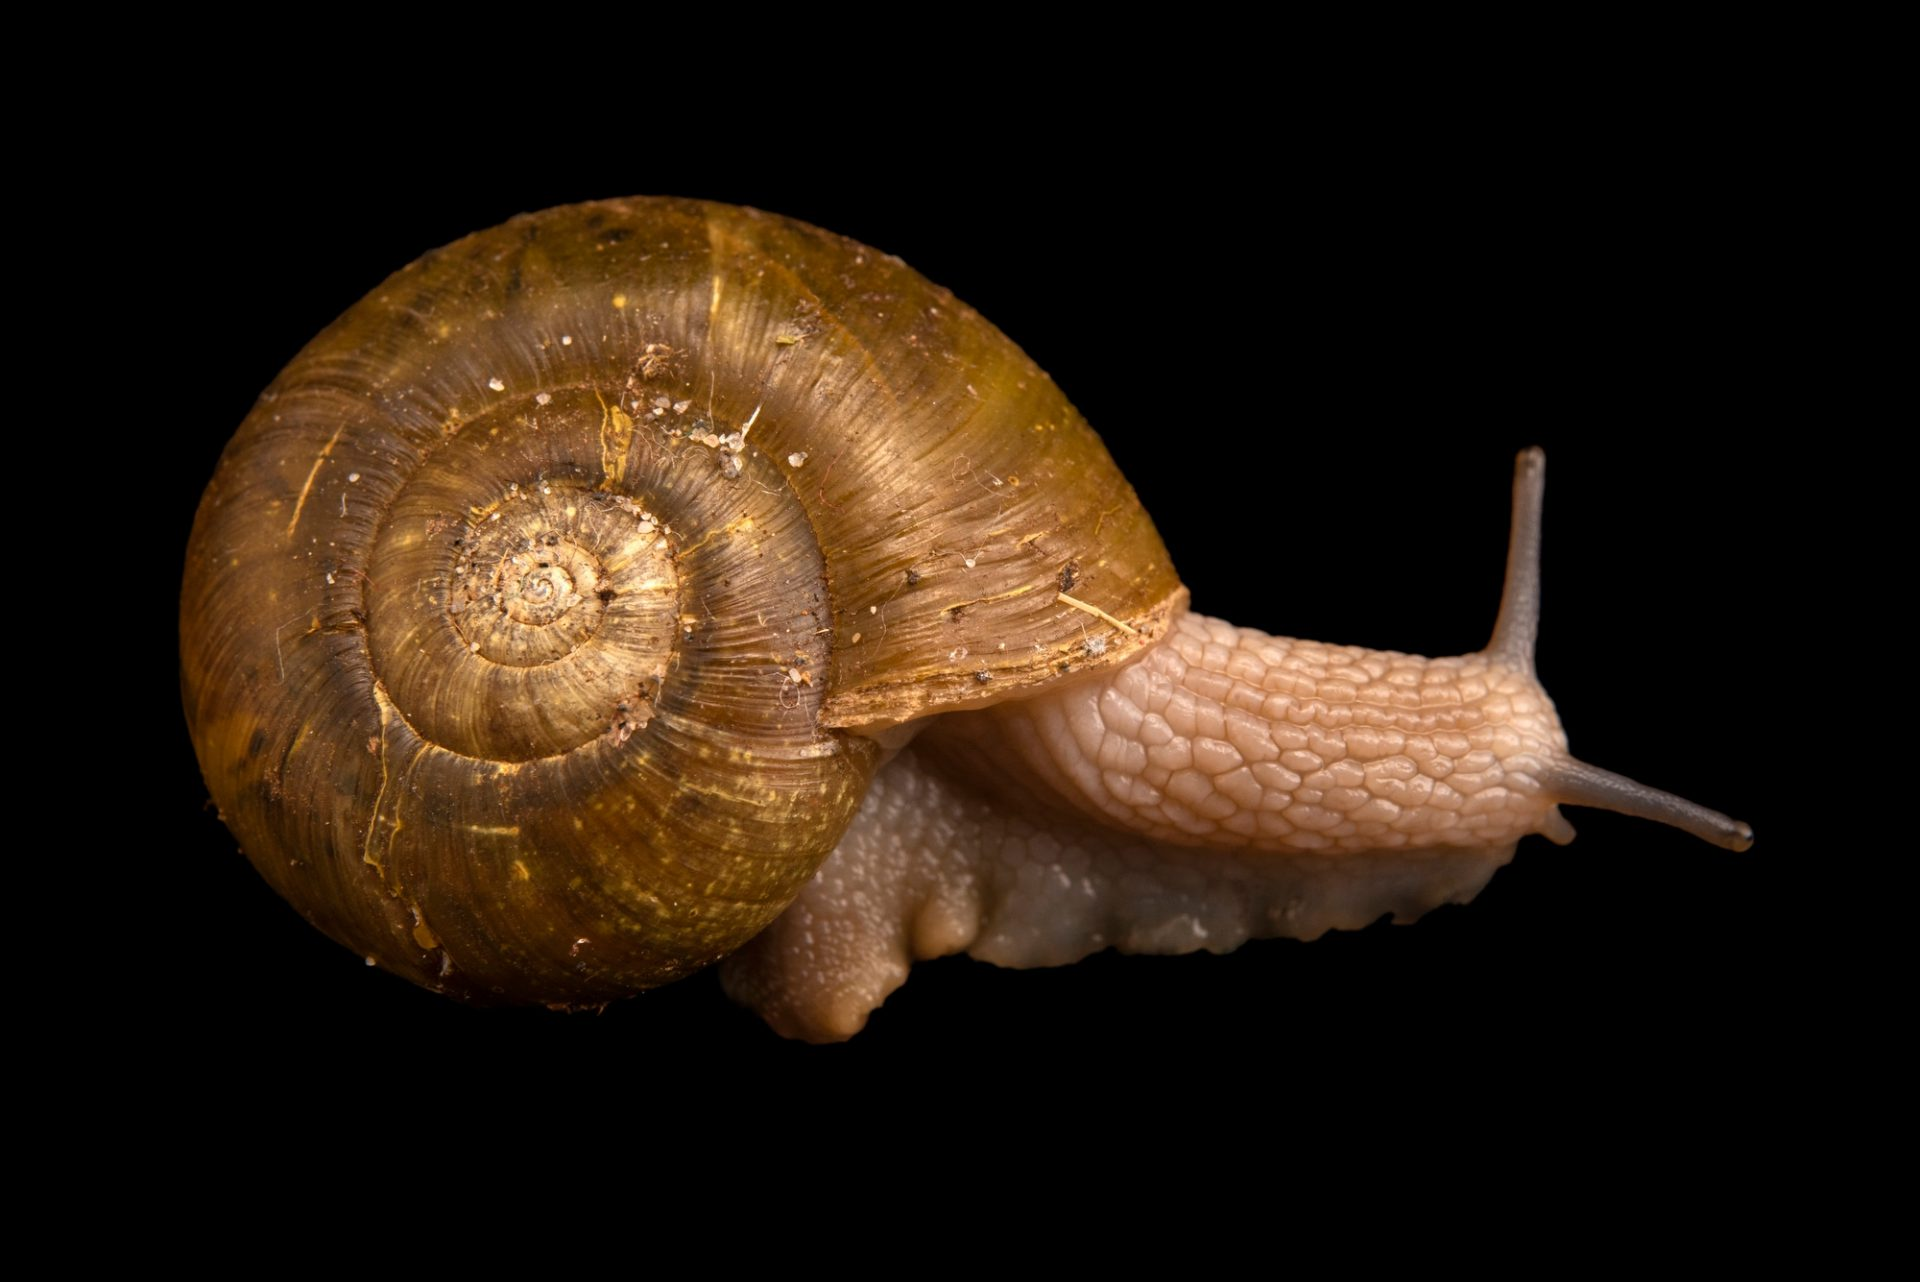 Photo: A robust lancetooth snail, Haplotrema vancouverense, at A Rocha Brooksdale Environmental Center in Surrey, BC.